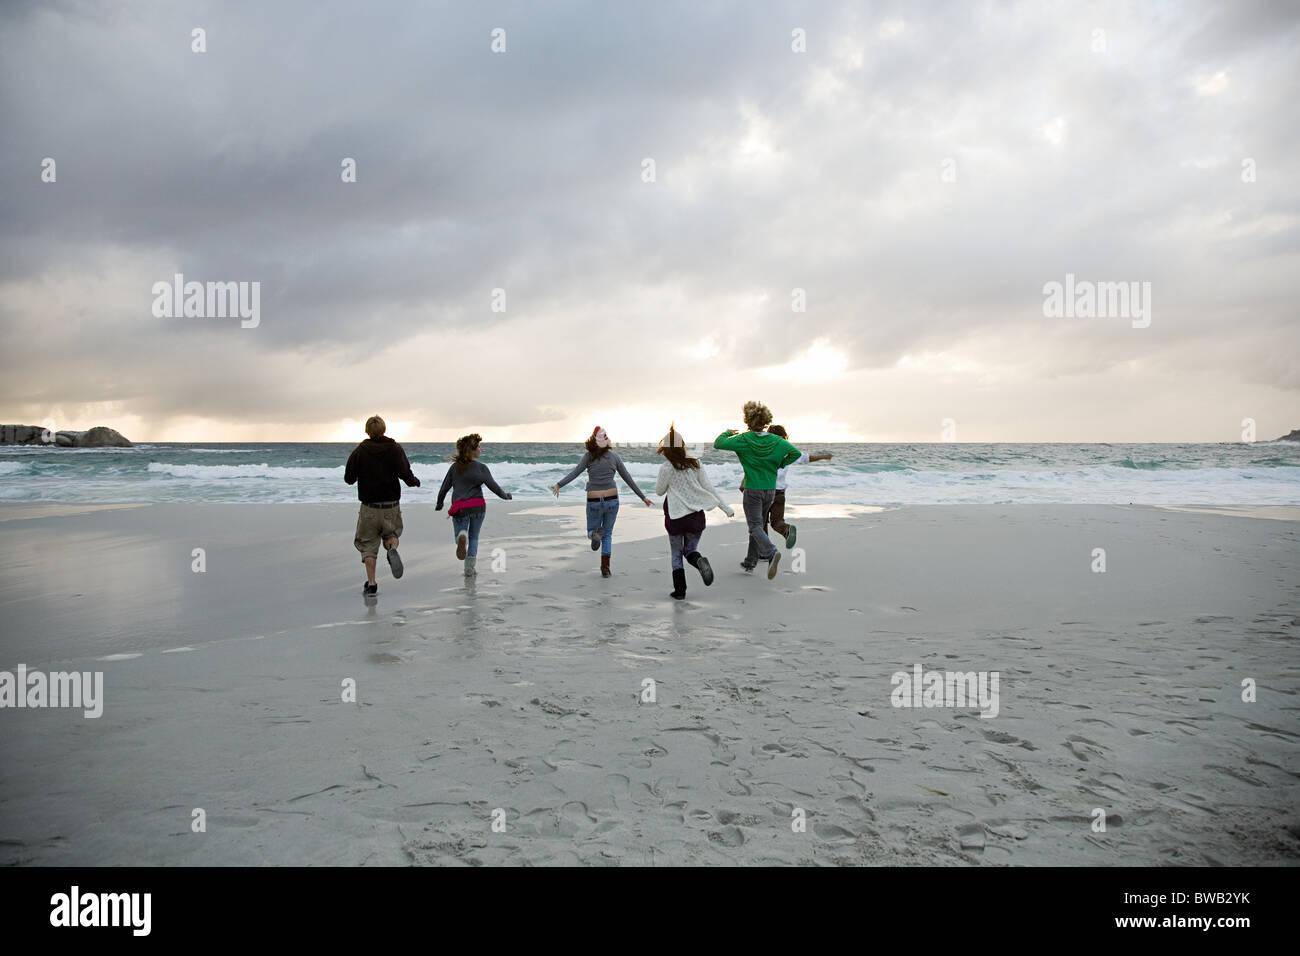 People running on beach - Stock Image